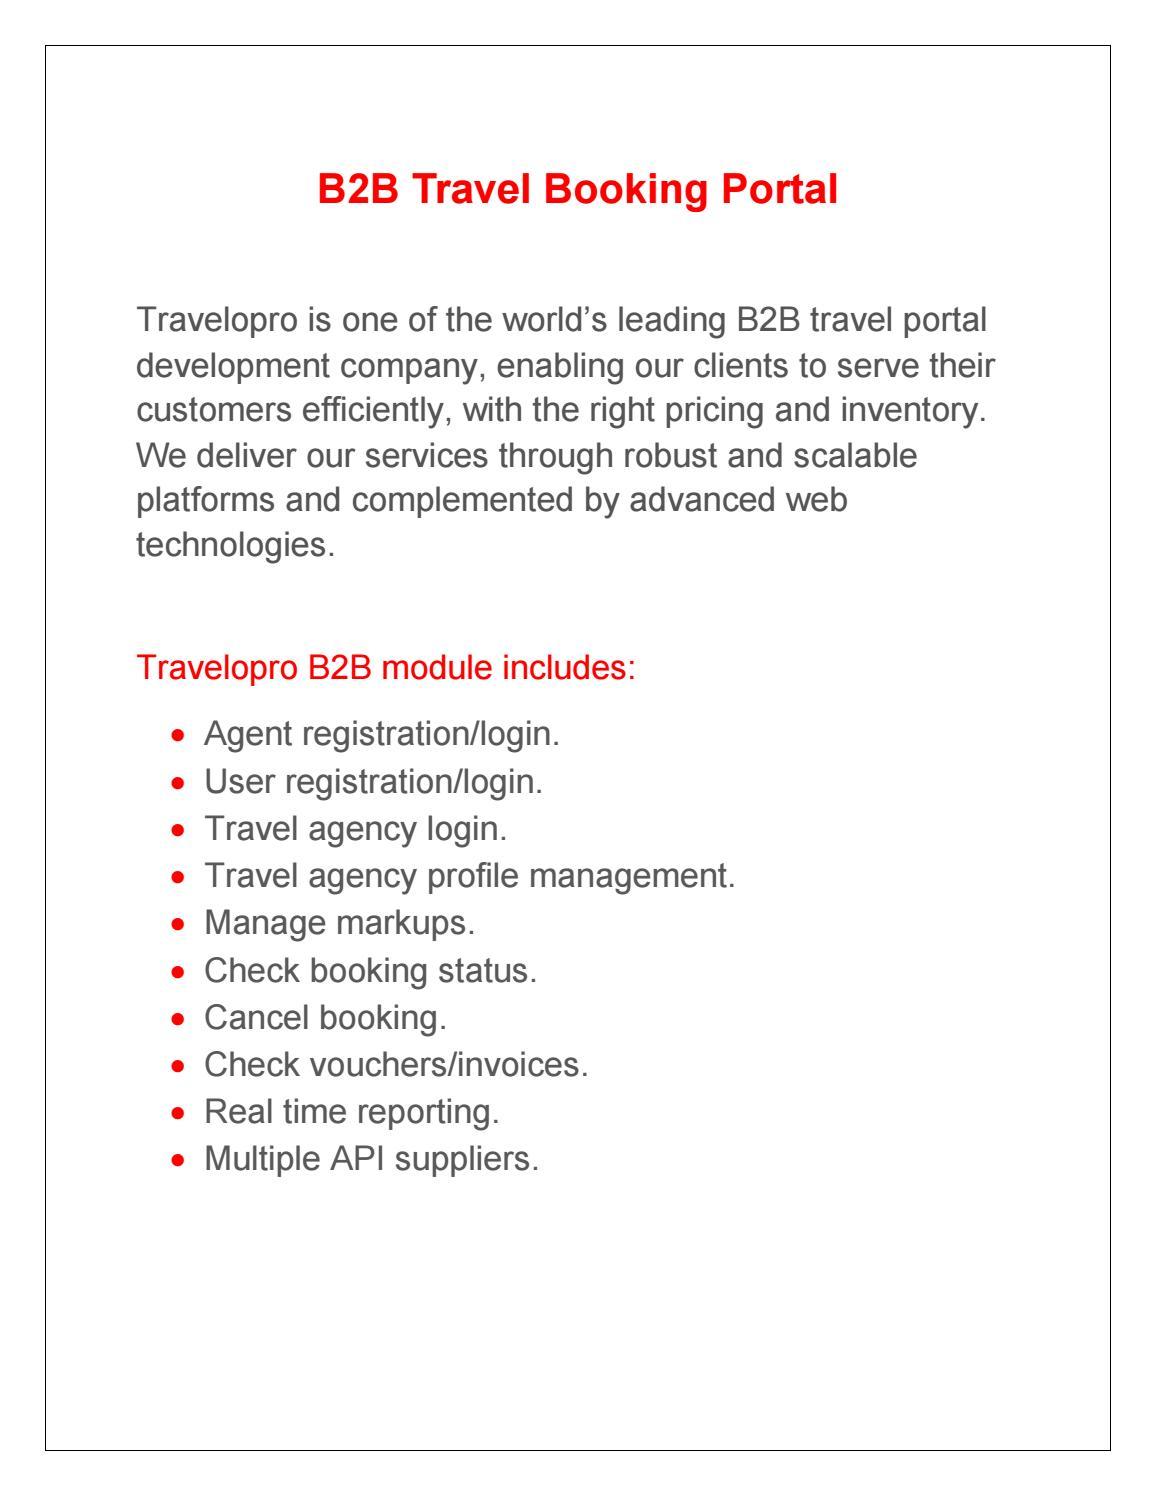 B2B Travel Booking Portal by anutrawex123 - issuu